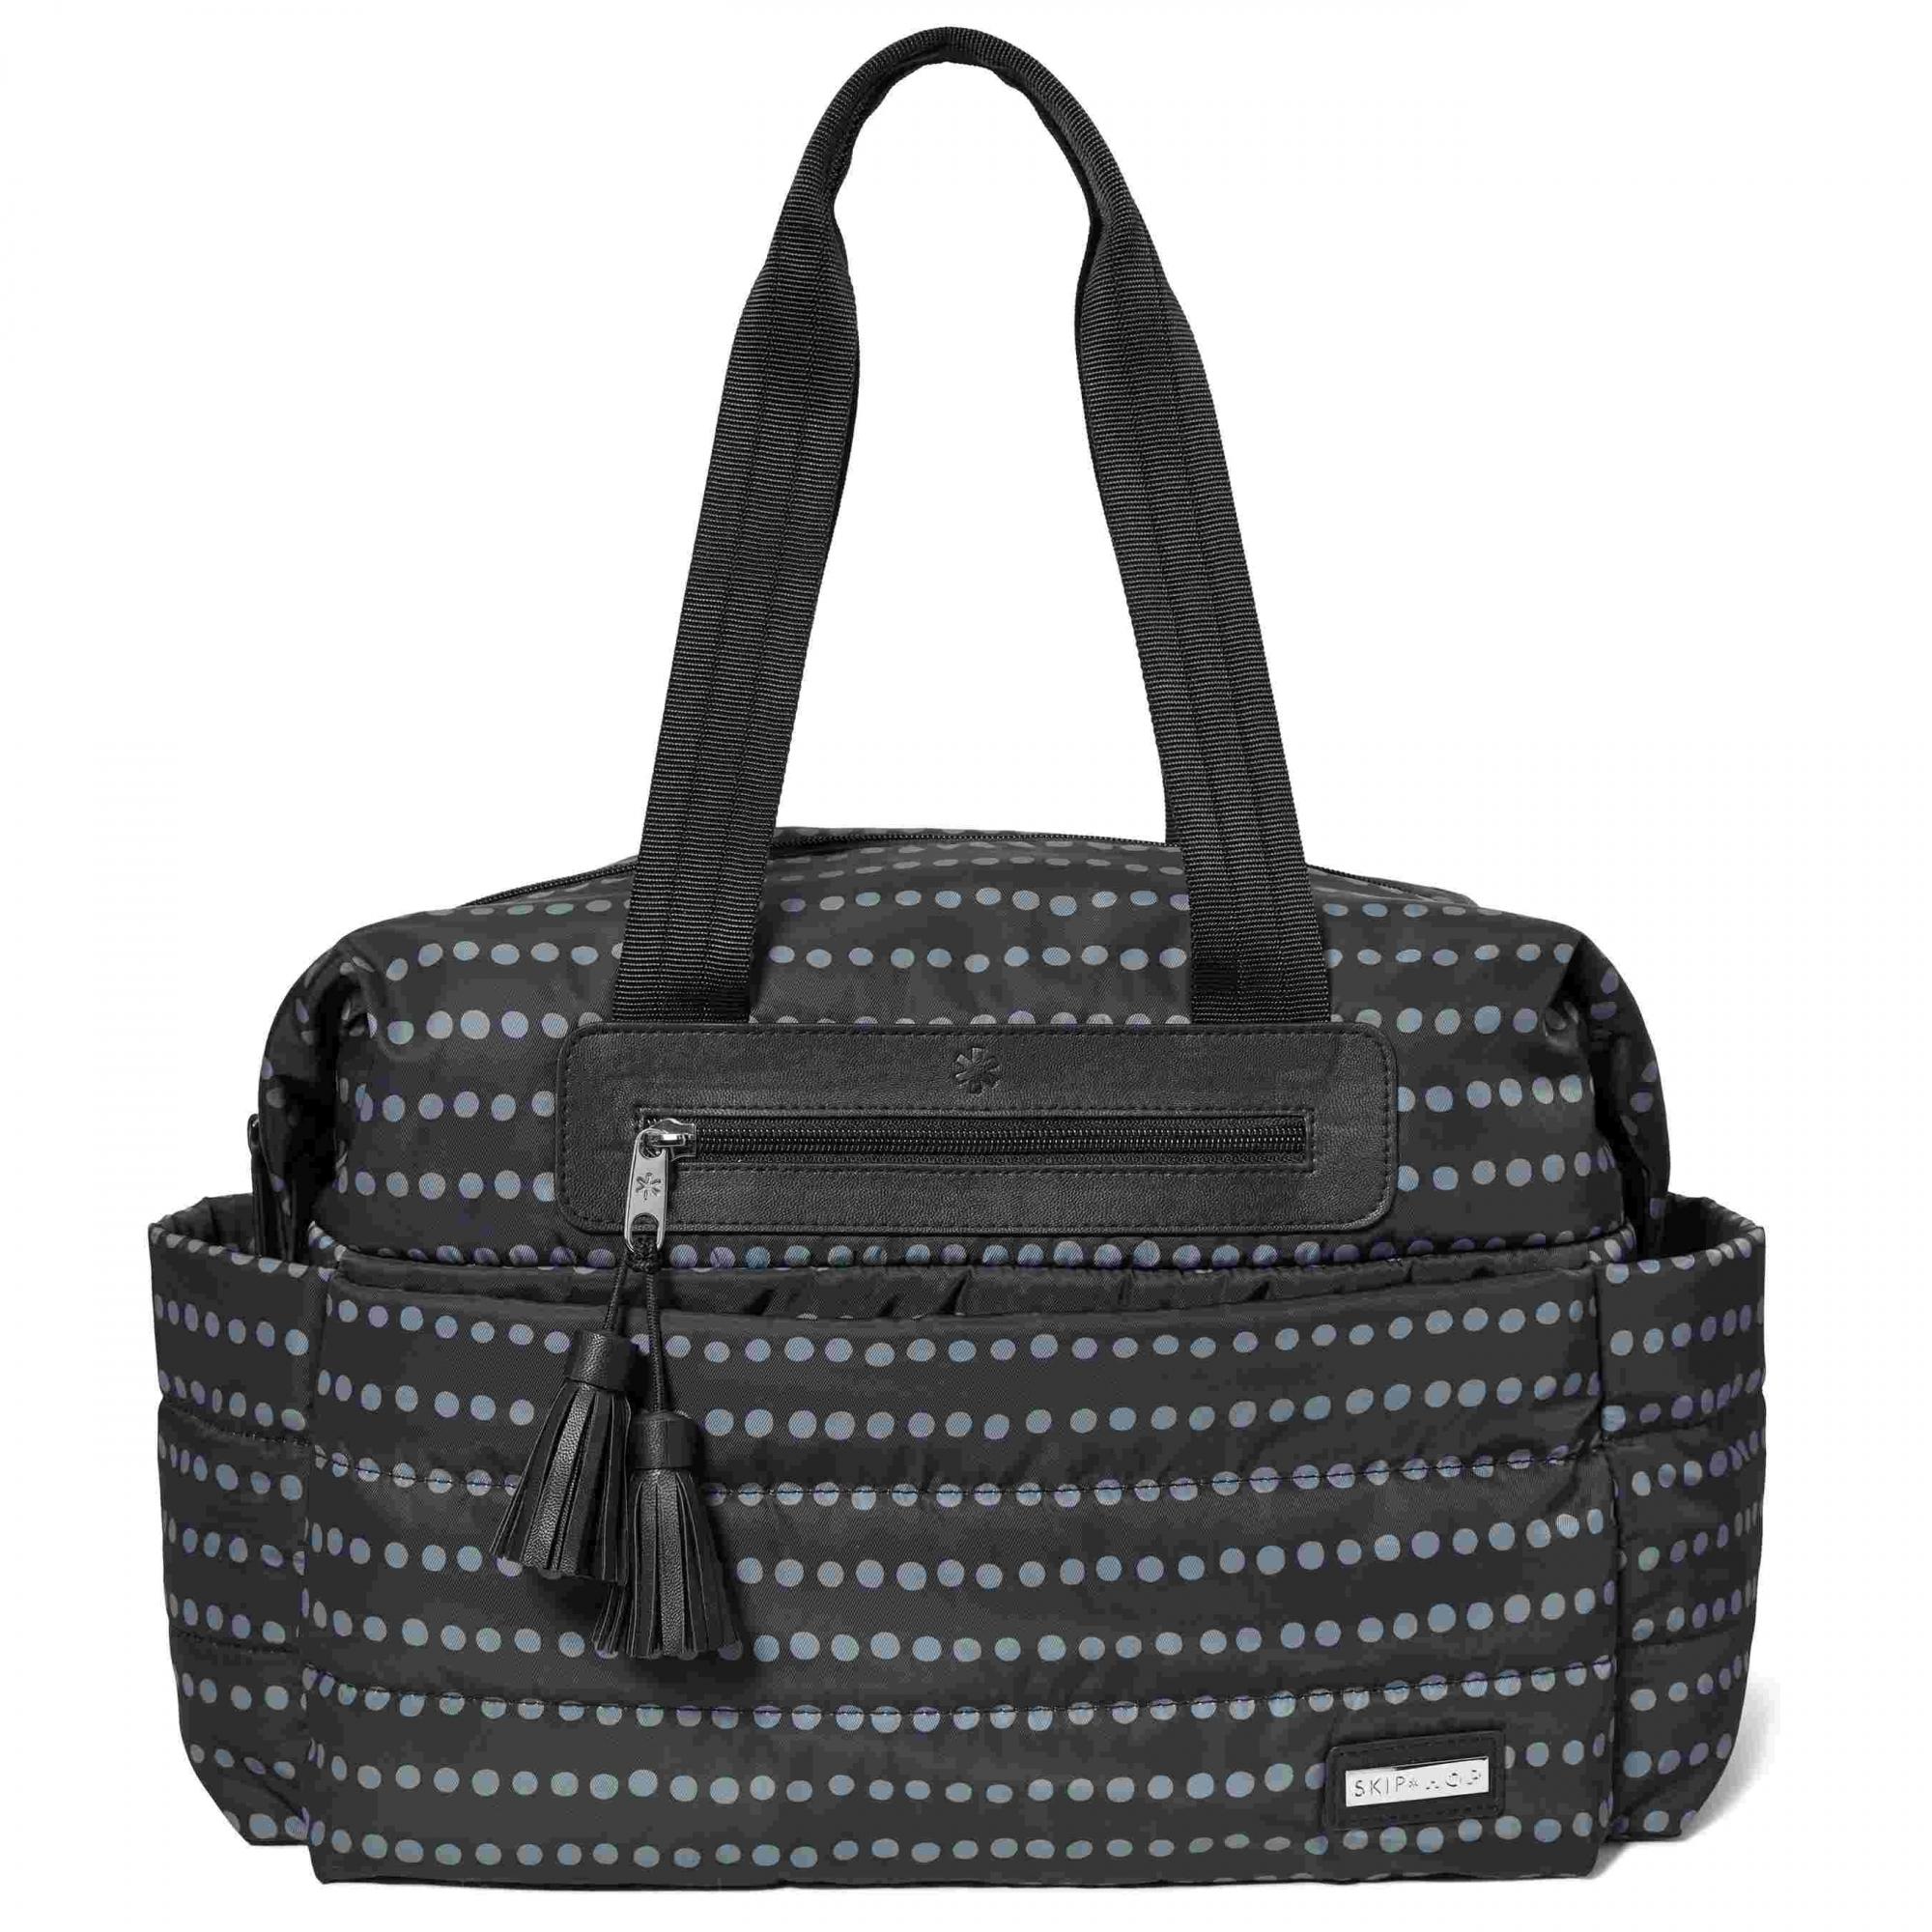 Bolsa Maternidade Skip Hop (Diaper Bag) Riverside Ultra Light Satchel